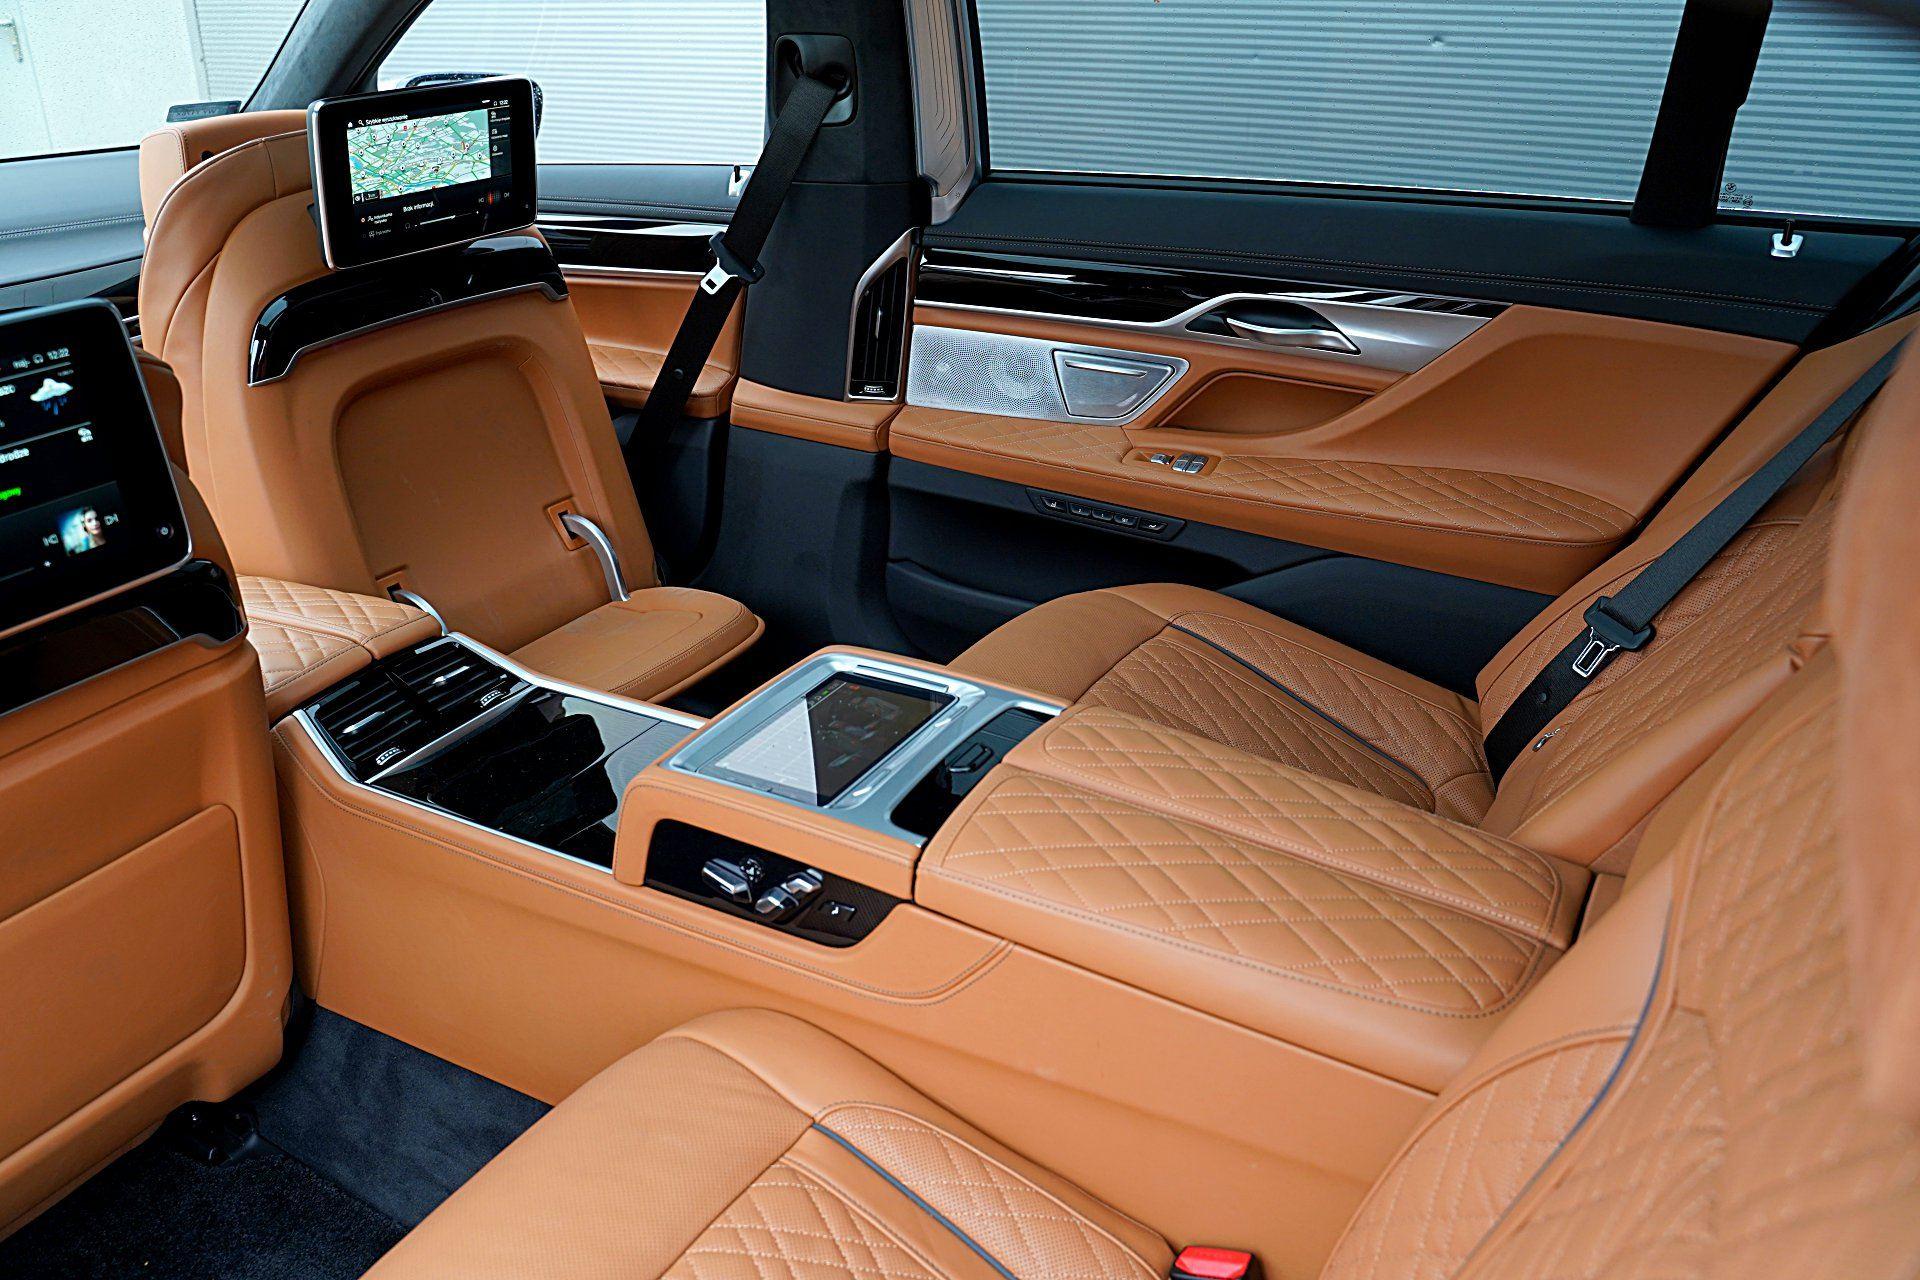 BMW 745Le G12 FL Plug-In Hybrid 3.0T fotele z tyłu